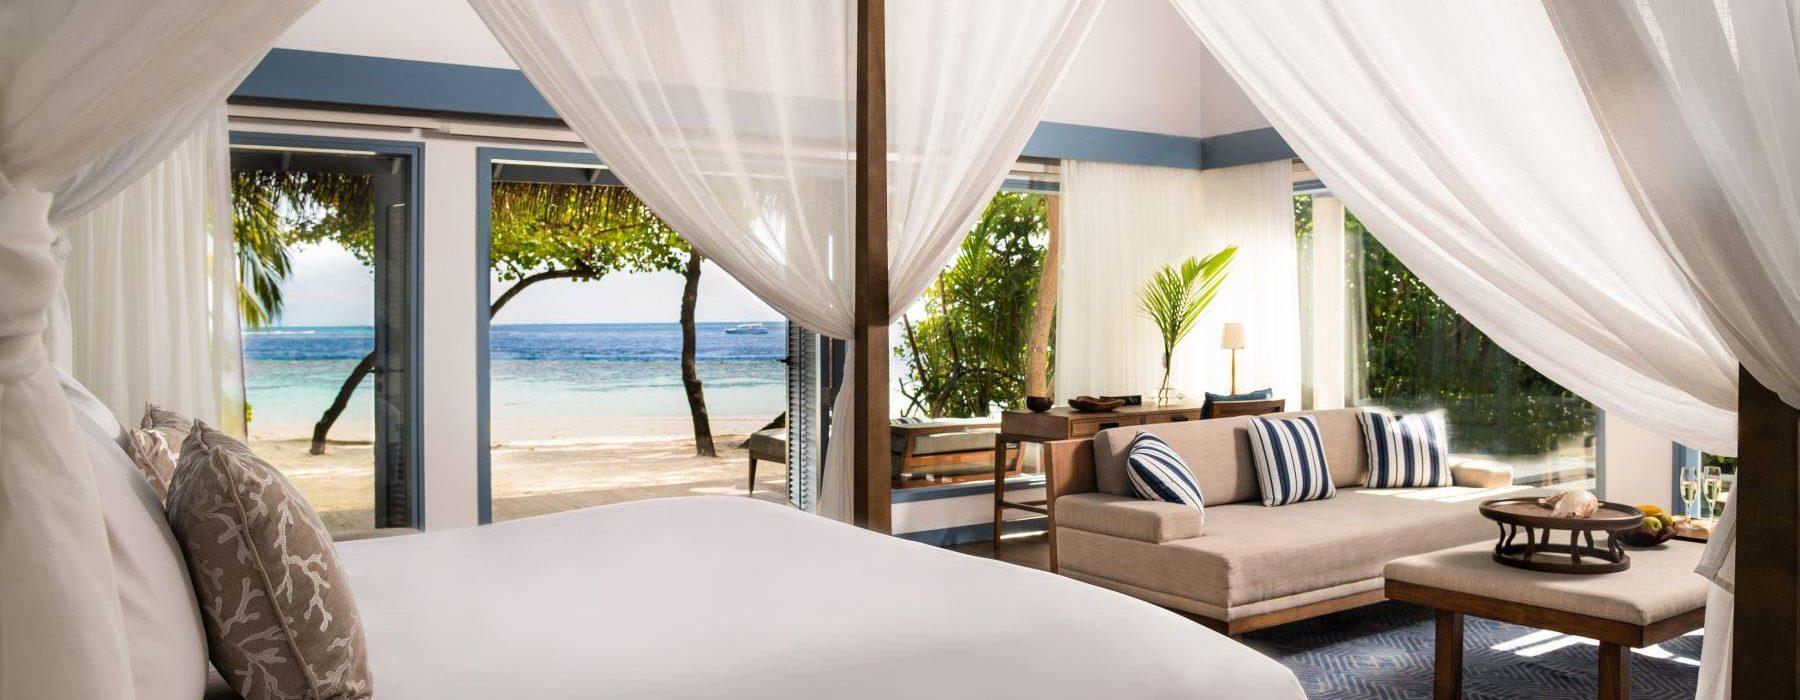 Raffles Maldives Meradhoo - Villas & Residences